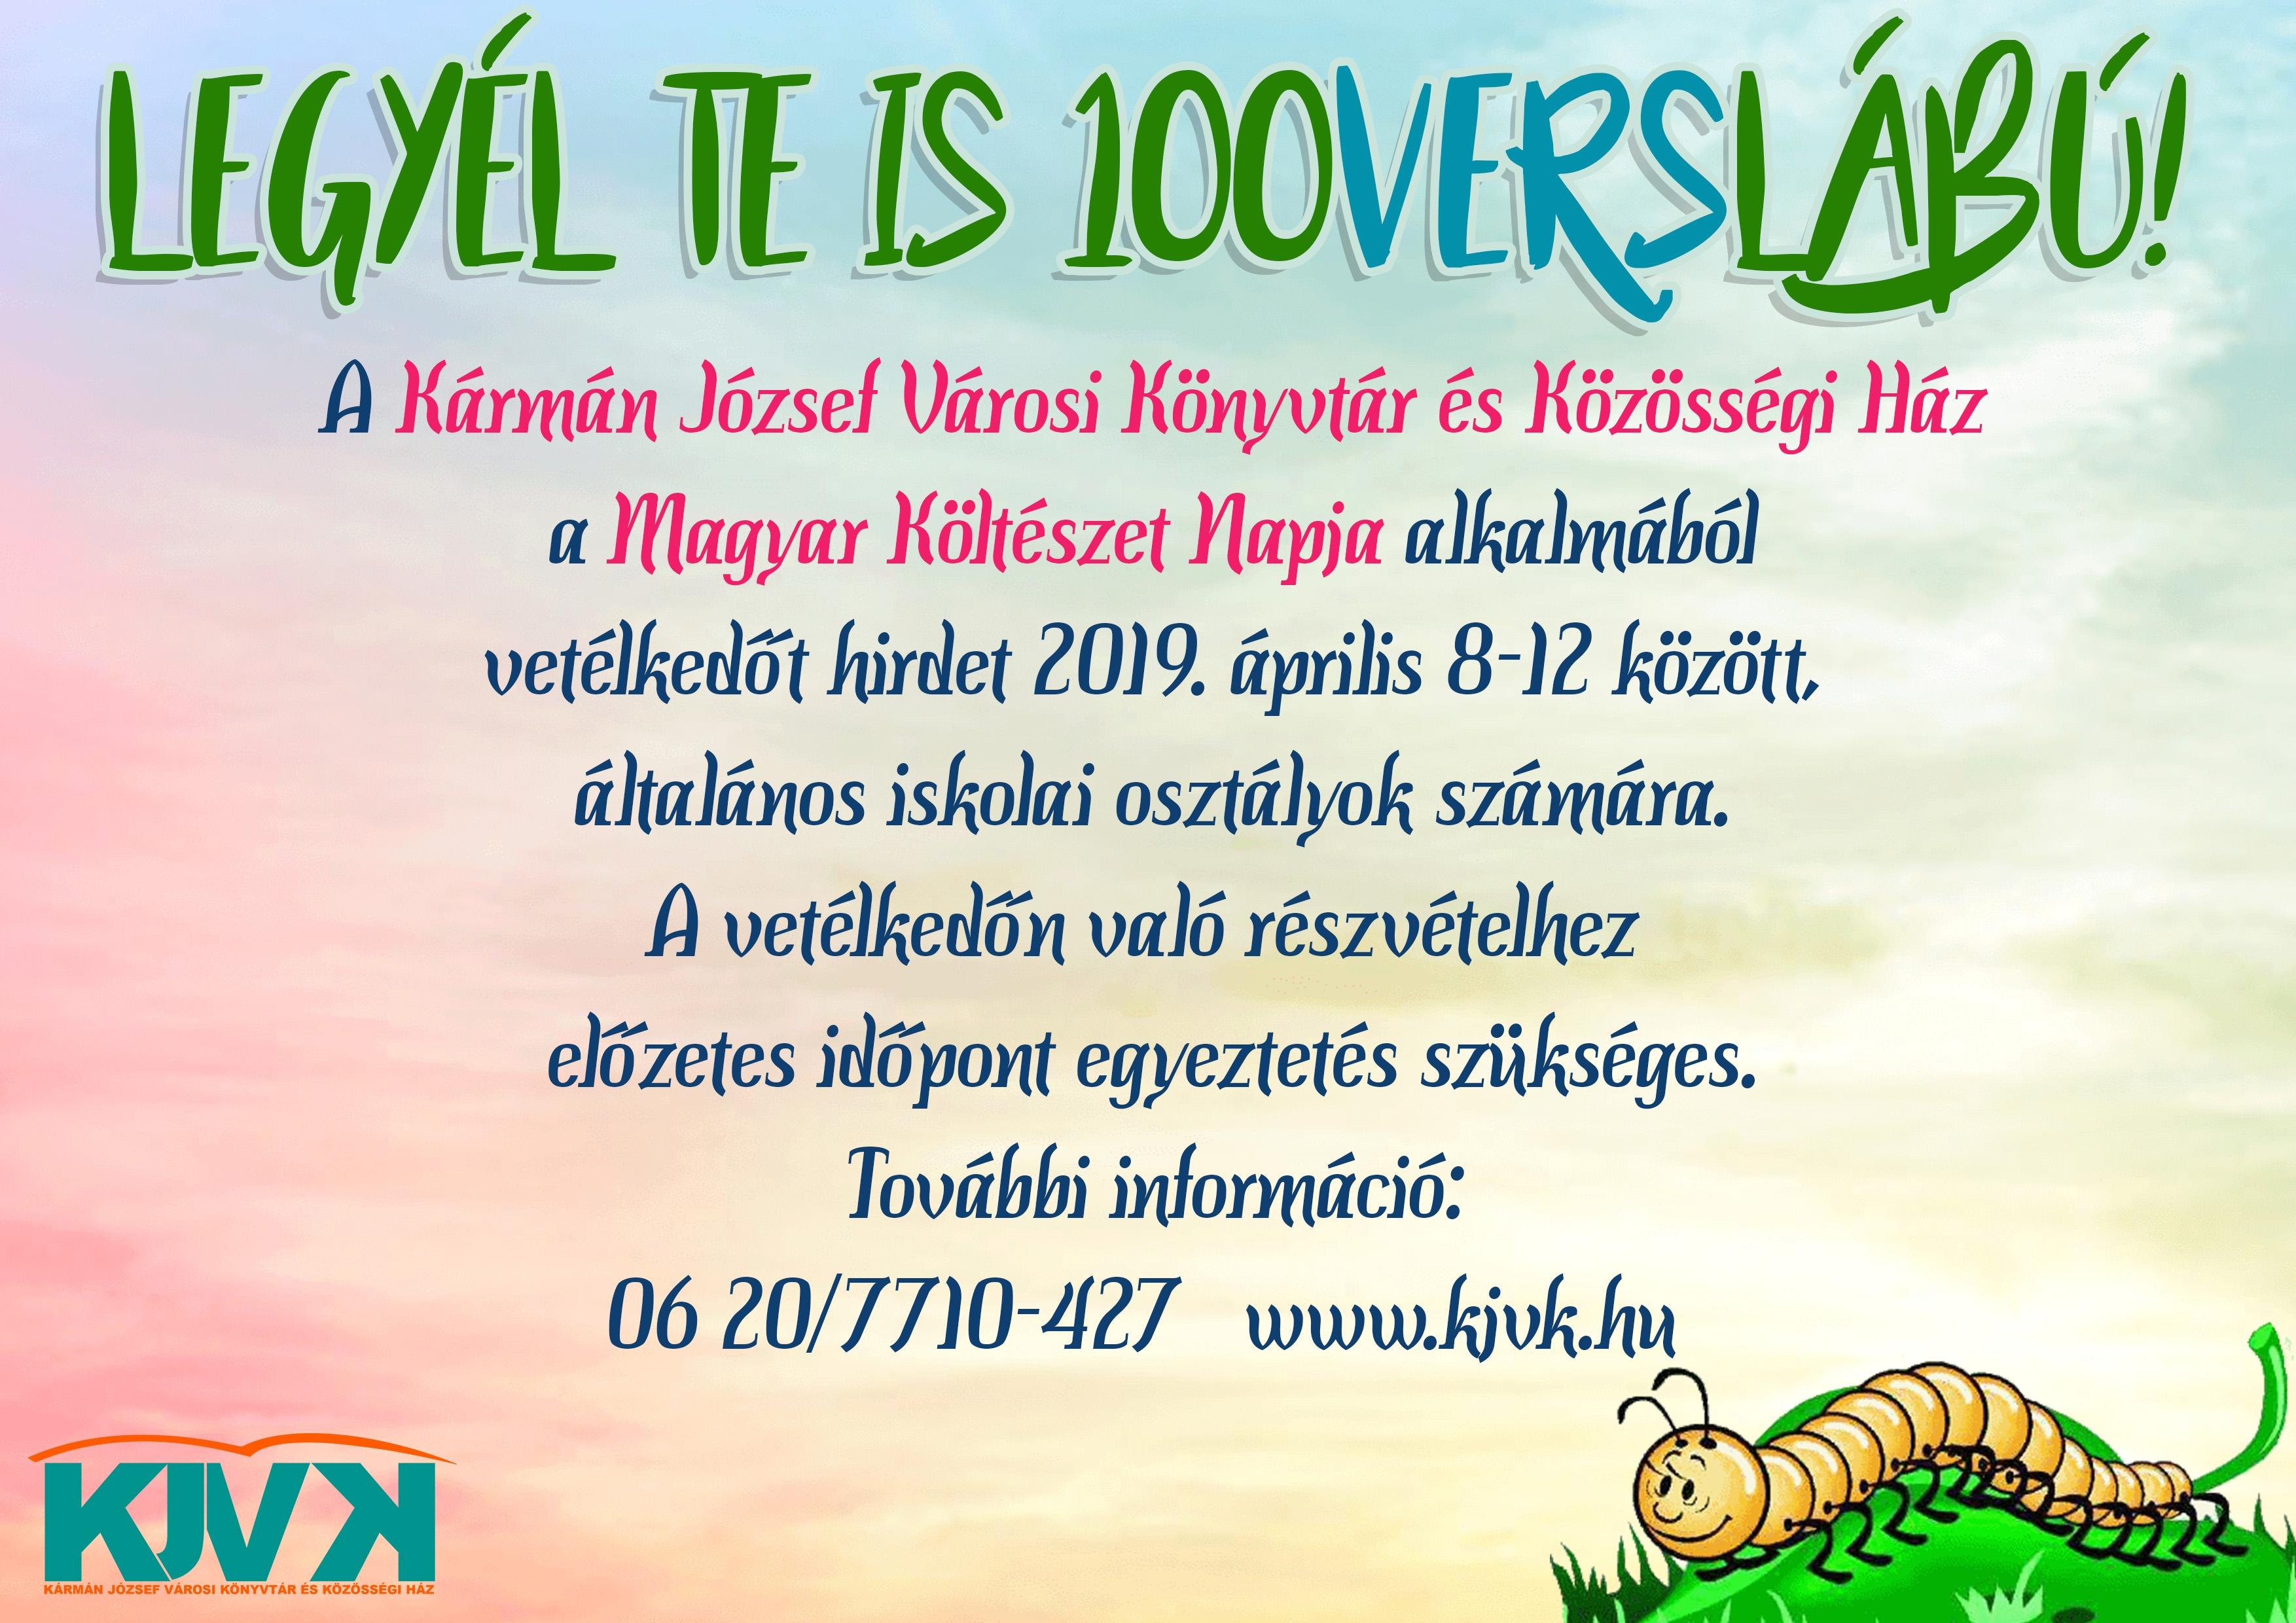 Kolteszet-napi-vetelkedo-2019-Plakat